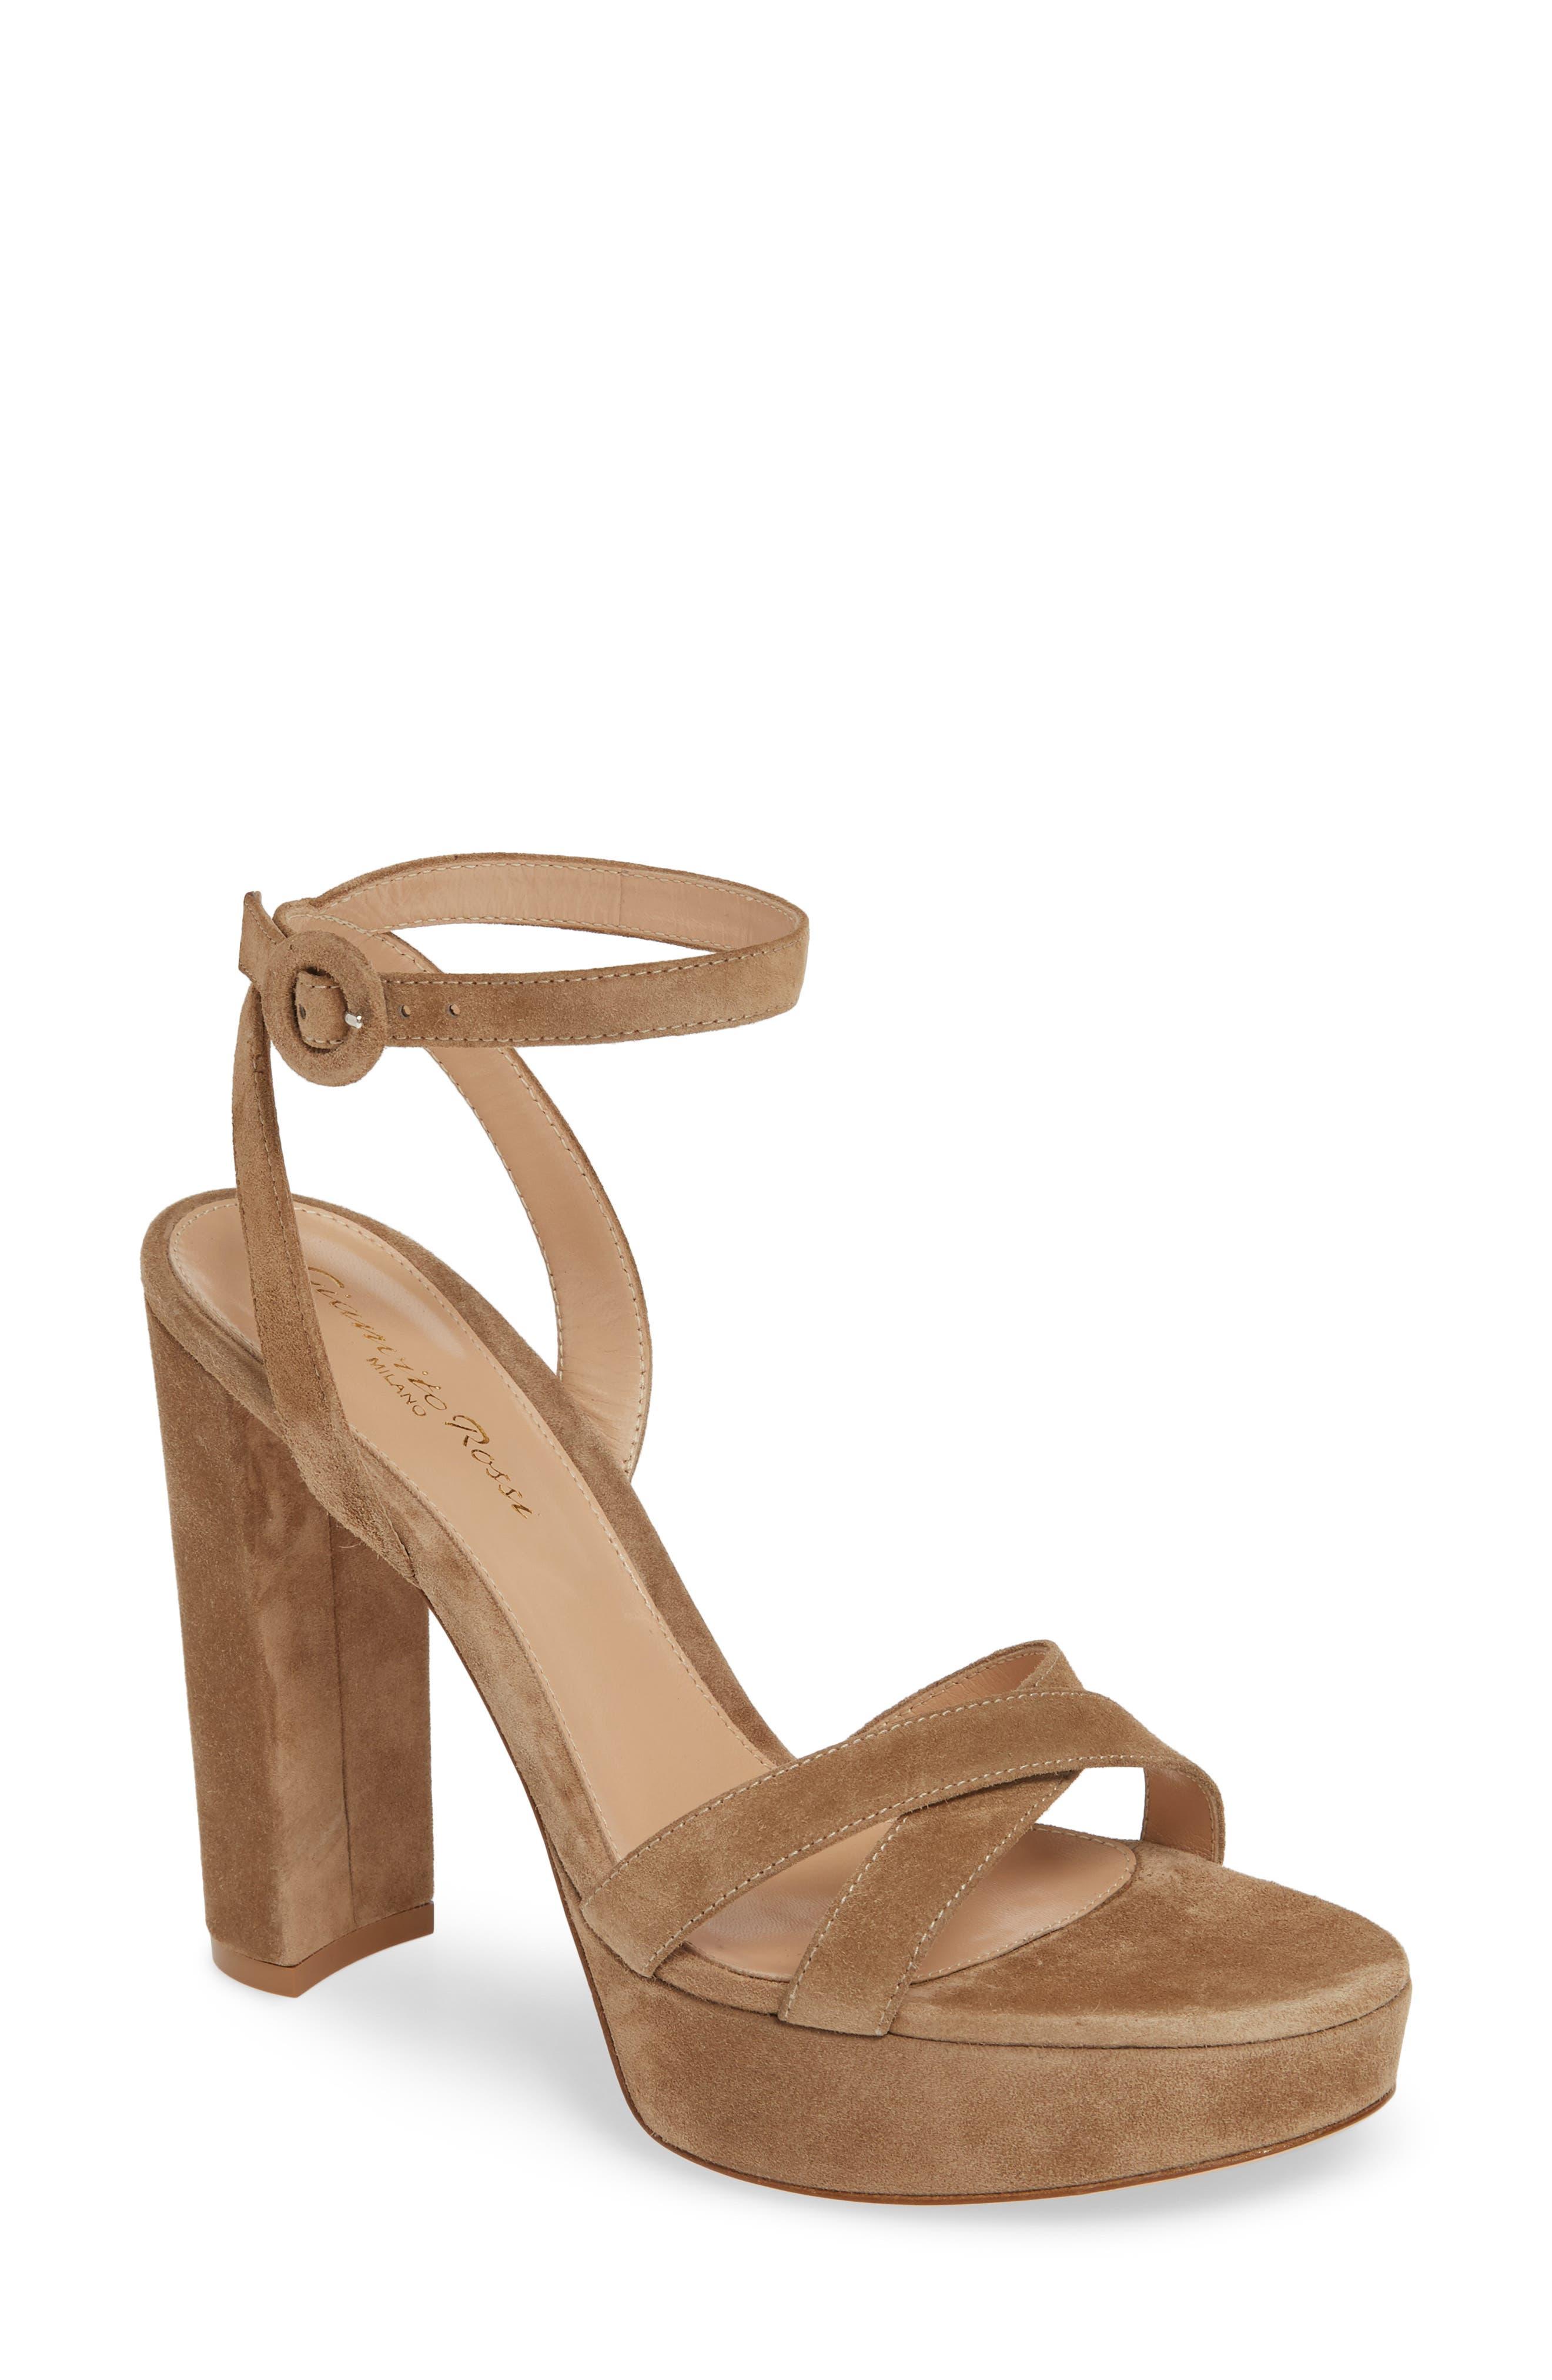 GIANVITO ROSSI Ankle Strap Platform Sandal, Main, color, CAMEL SUEDE